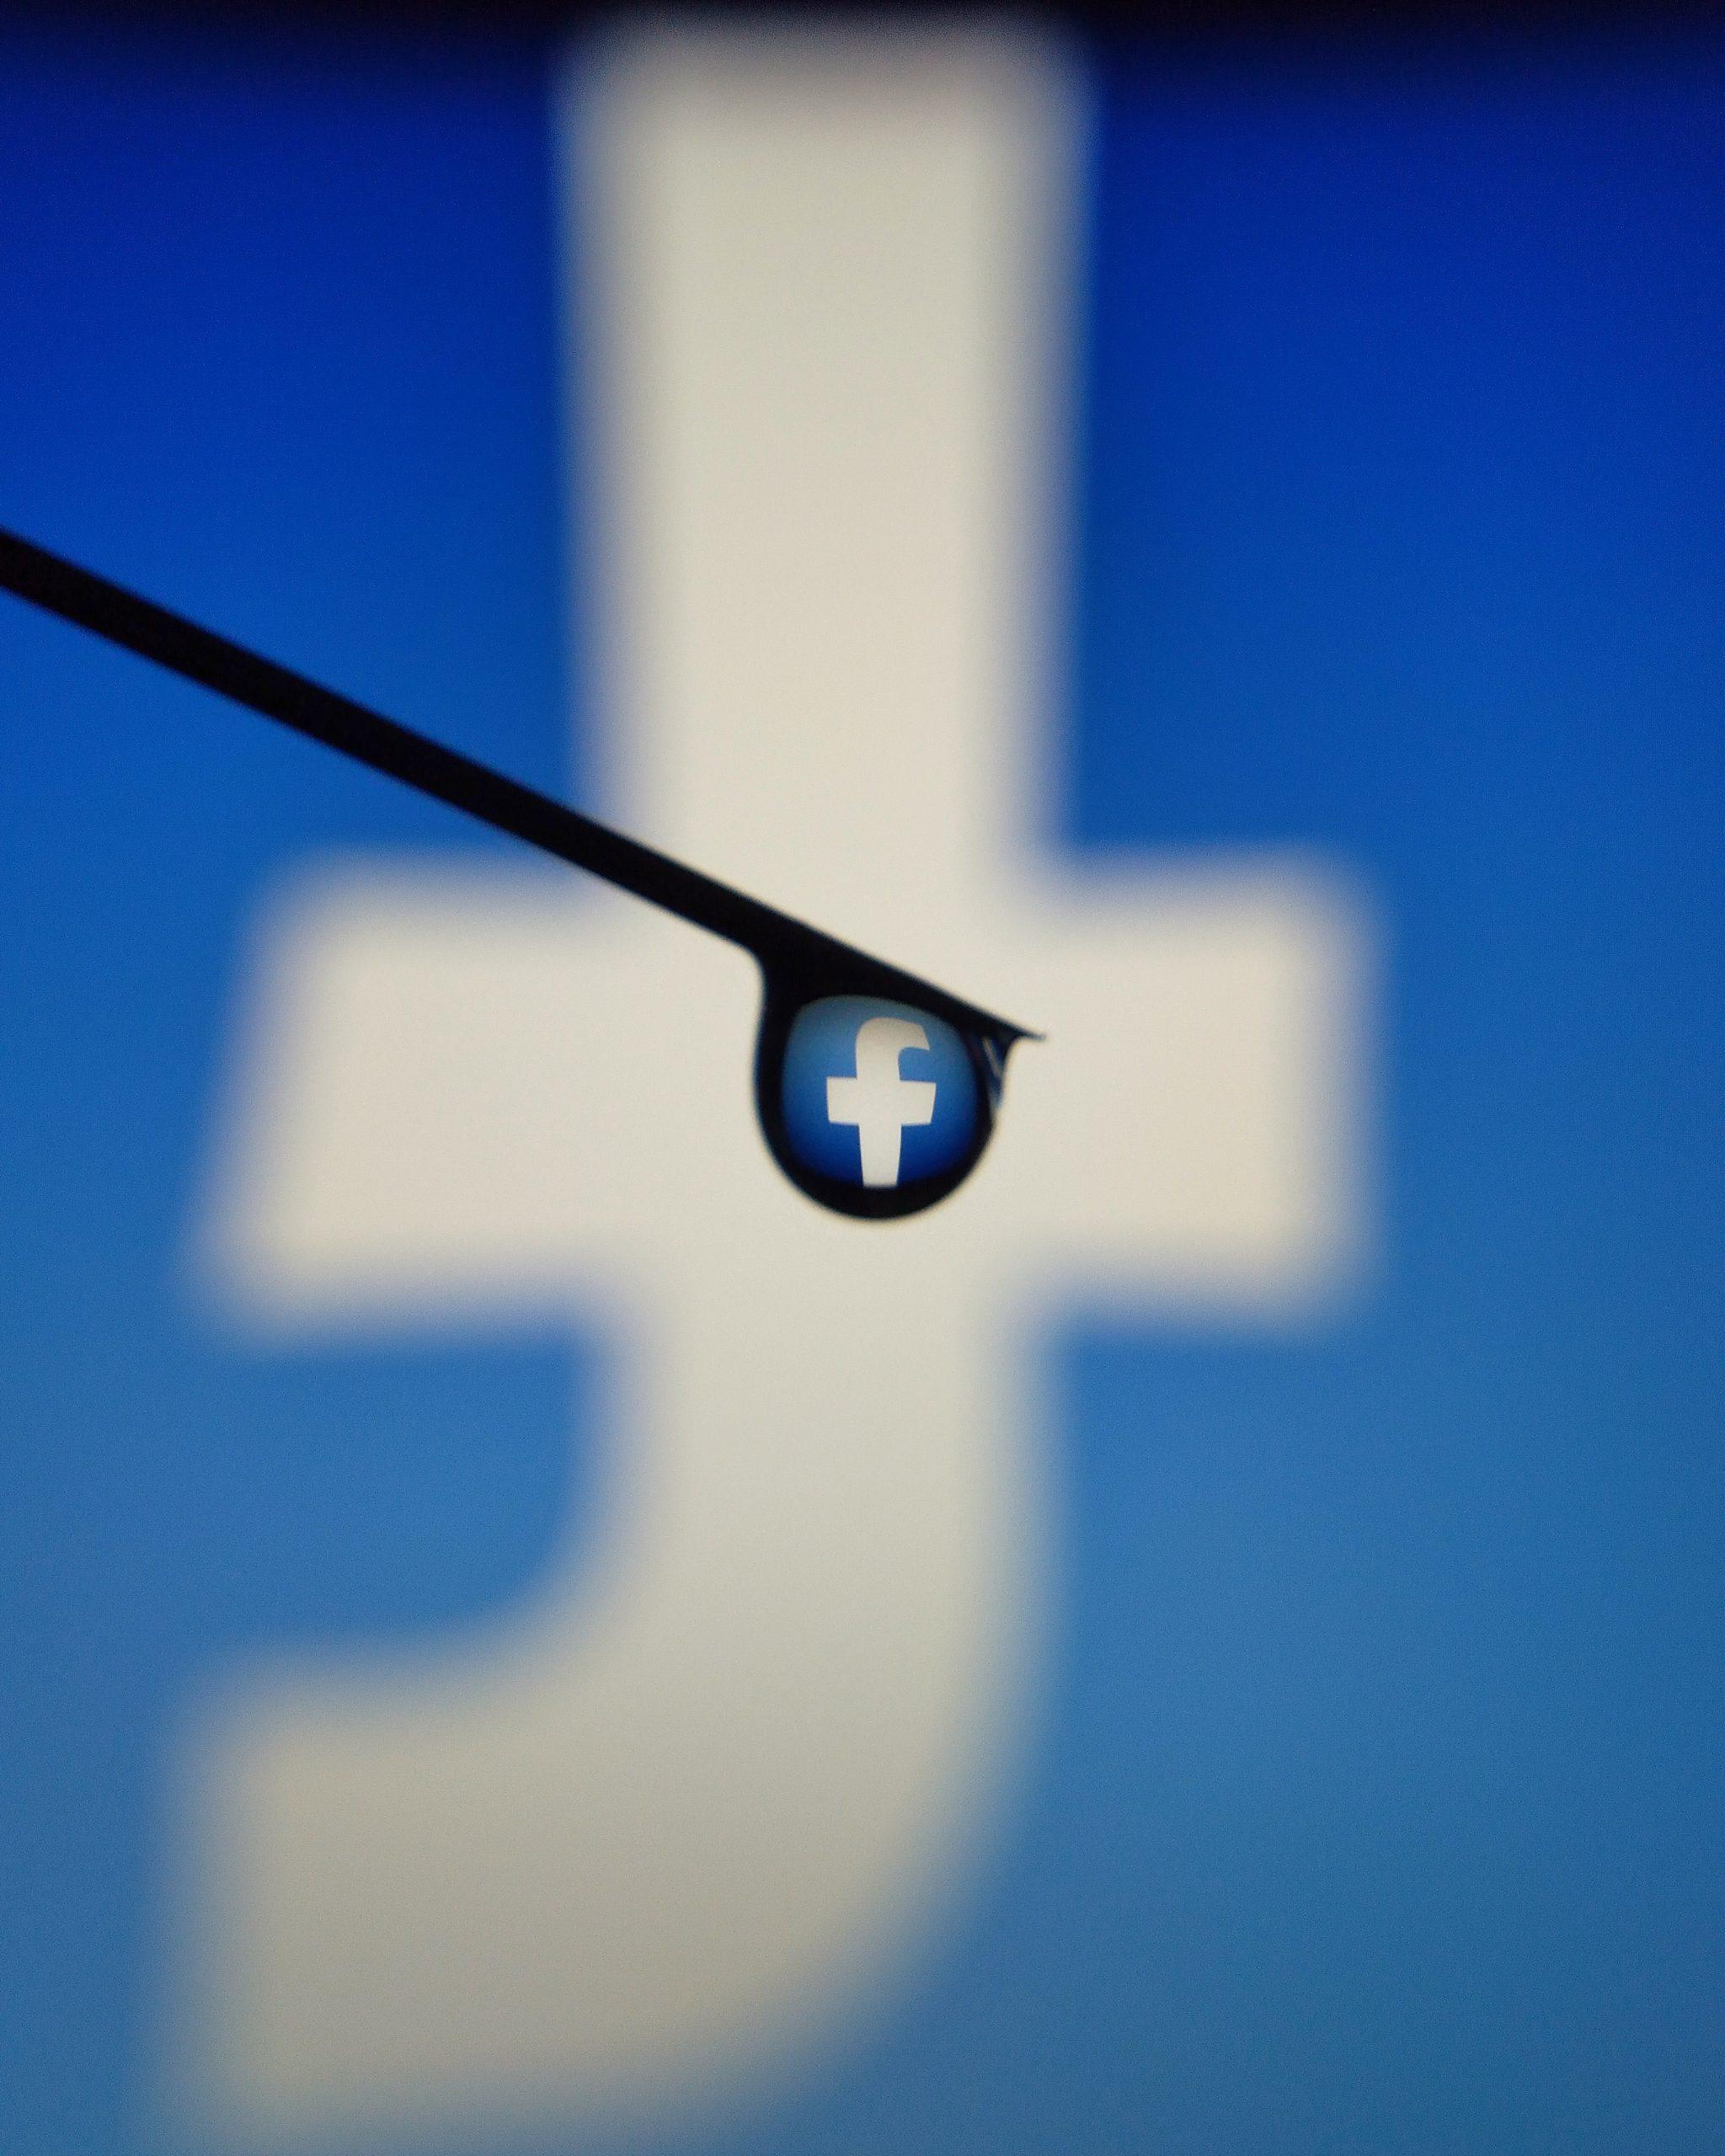 Logo of Facebook company